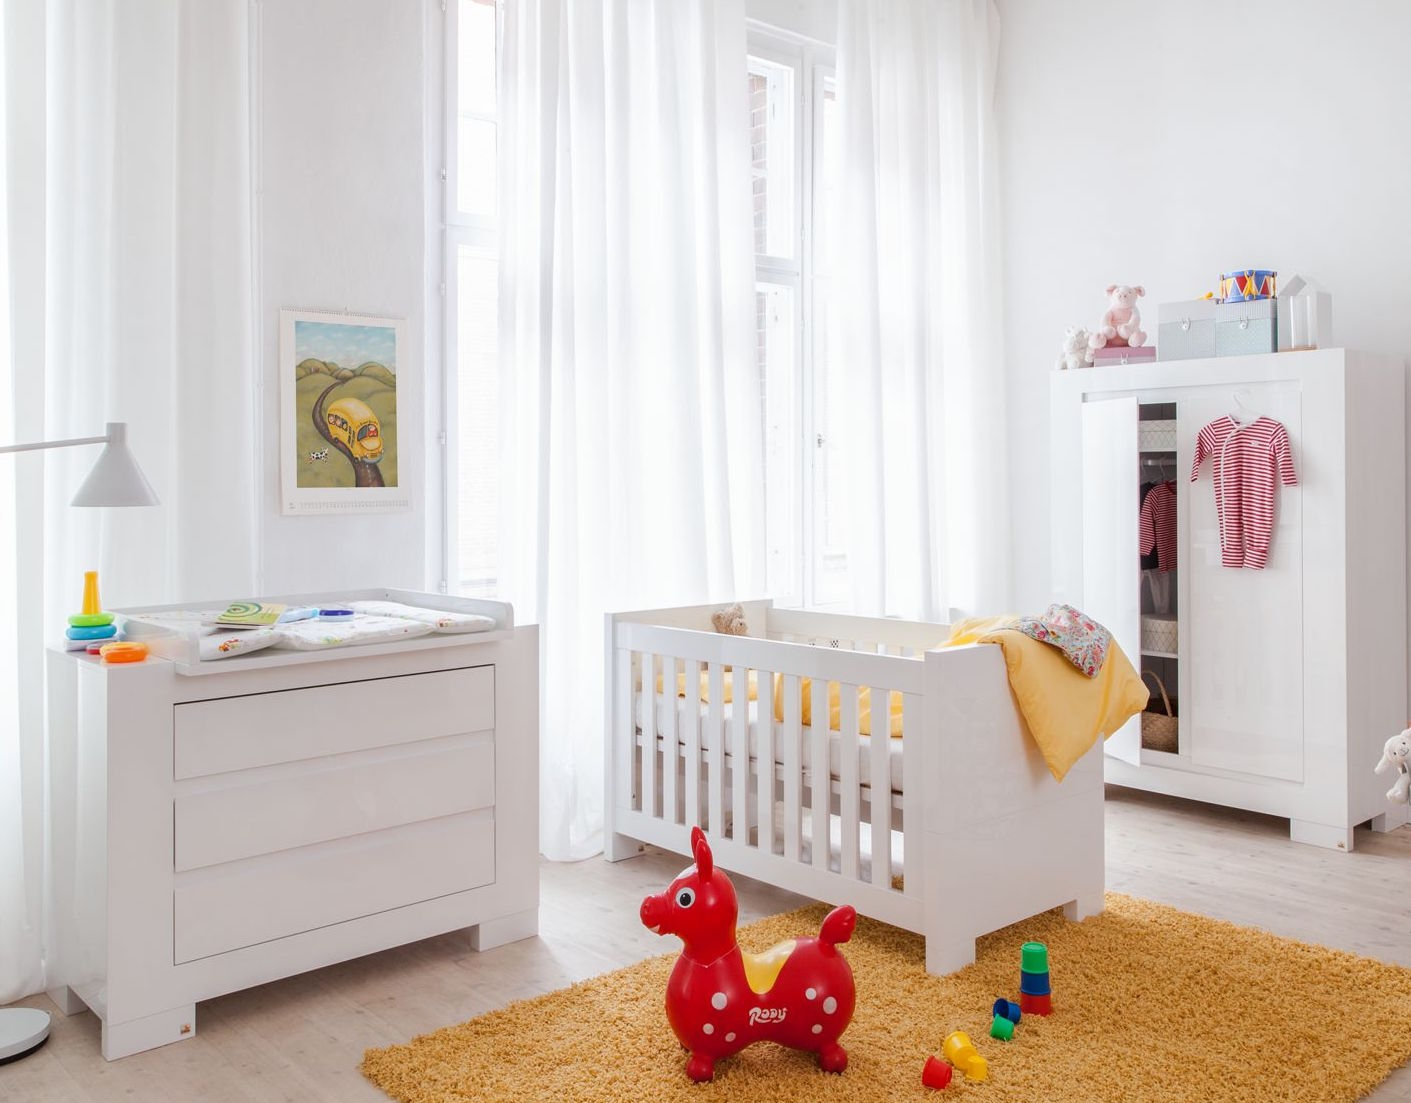 Sears chambre de bebe ~ Design de maison